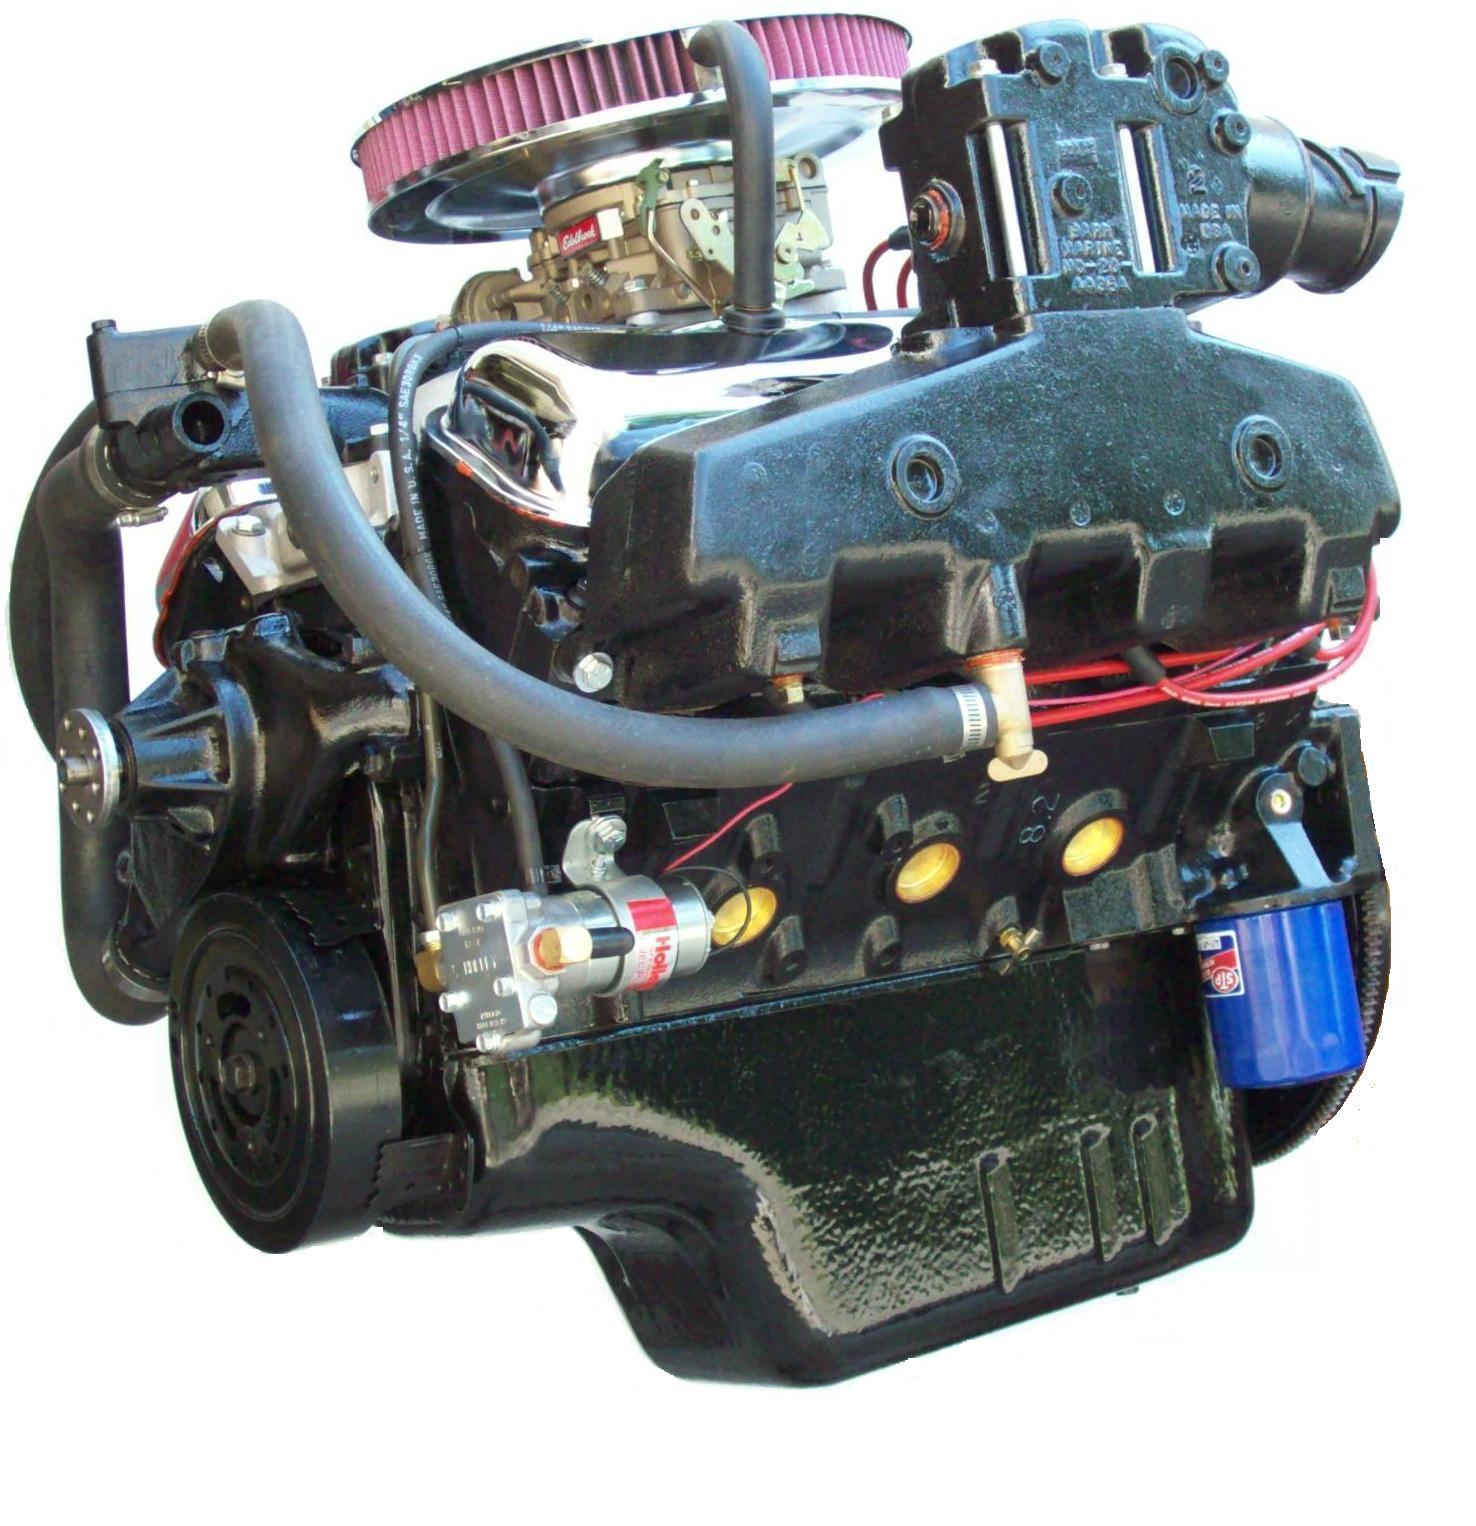 Volvo 4 3 Liter Marine Engine Diagram Auto Electrical Wiring Mercruiser Drain Plug Diaram